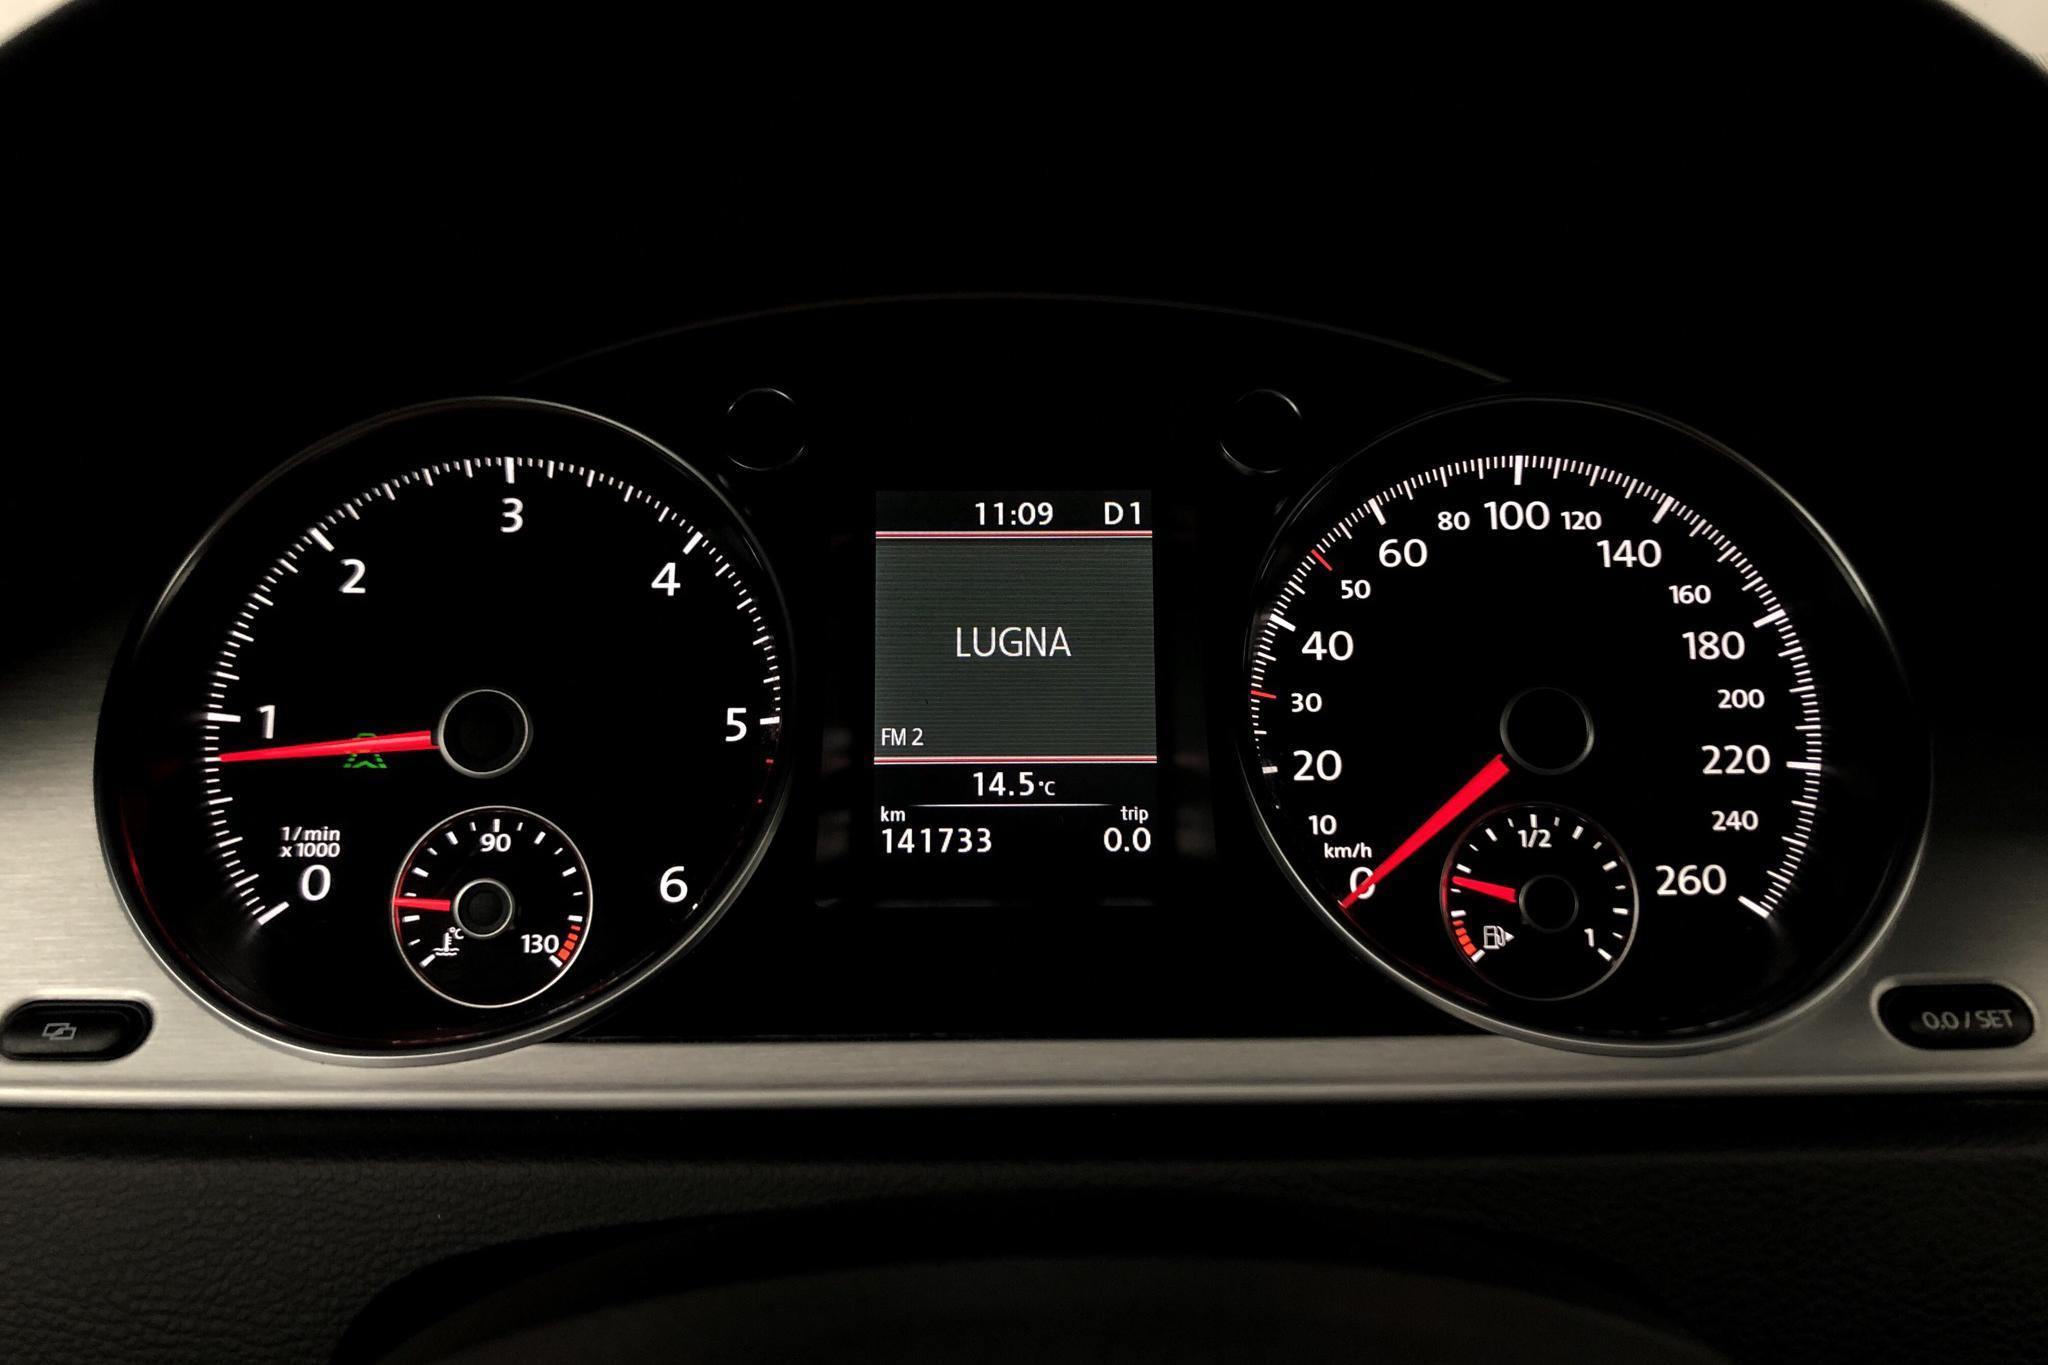 VW Passat Alltrack 2.0 TDI BlueMotion Technology 4Motion (170hk) - 141 730 km - Automatic - Dark Blue - 2012